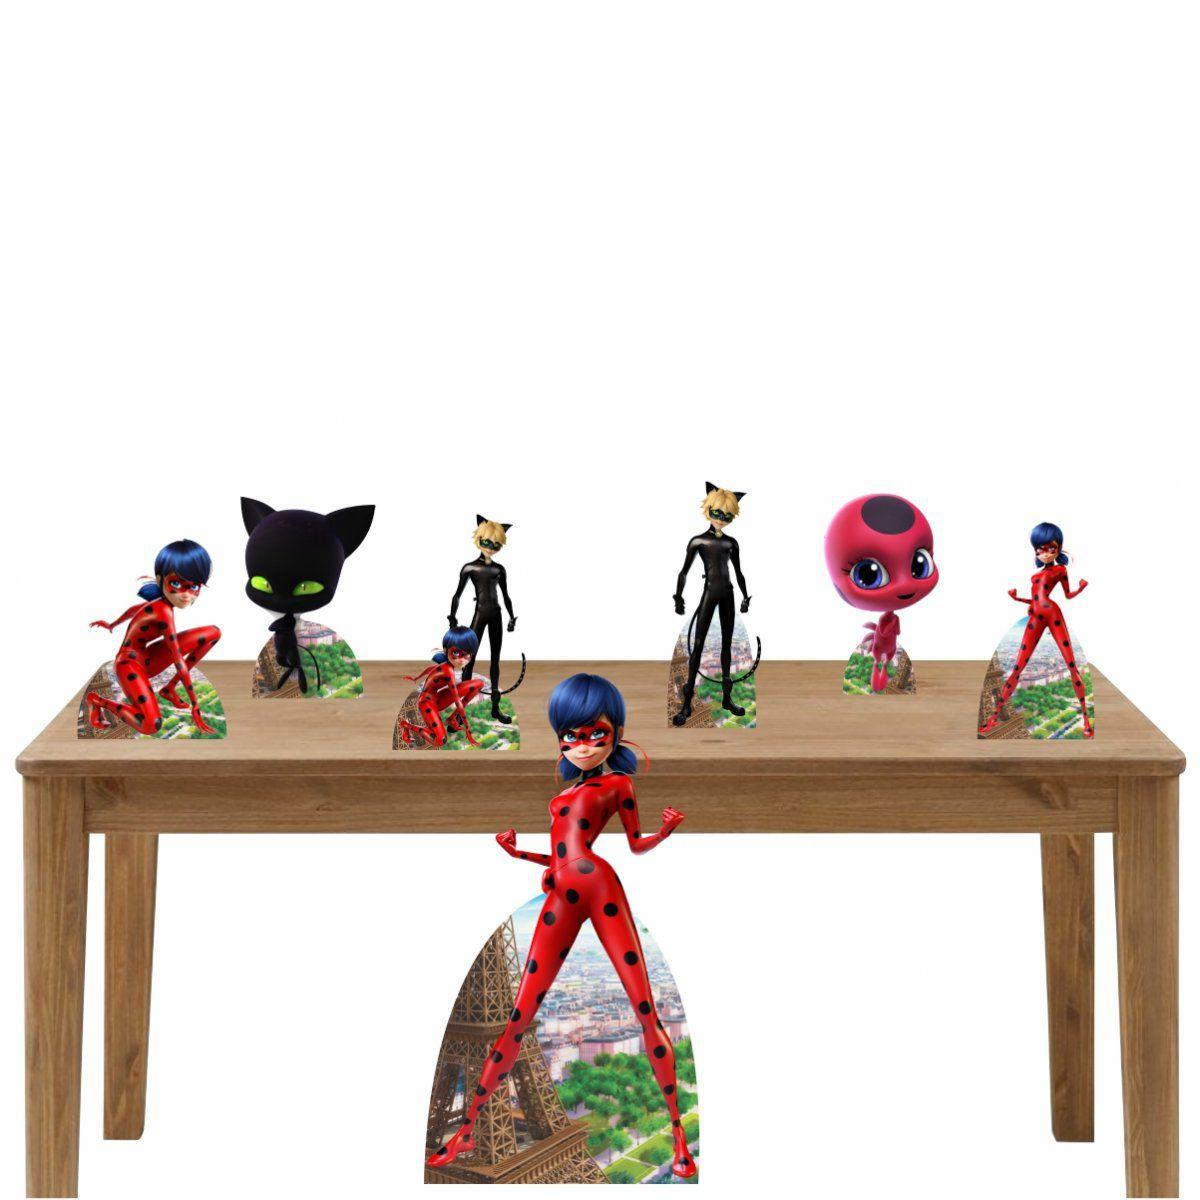 Kit 2 Decoração de Festa Totem Display Ladybug - 7 Peças